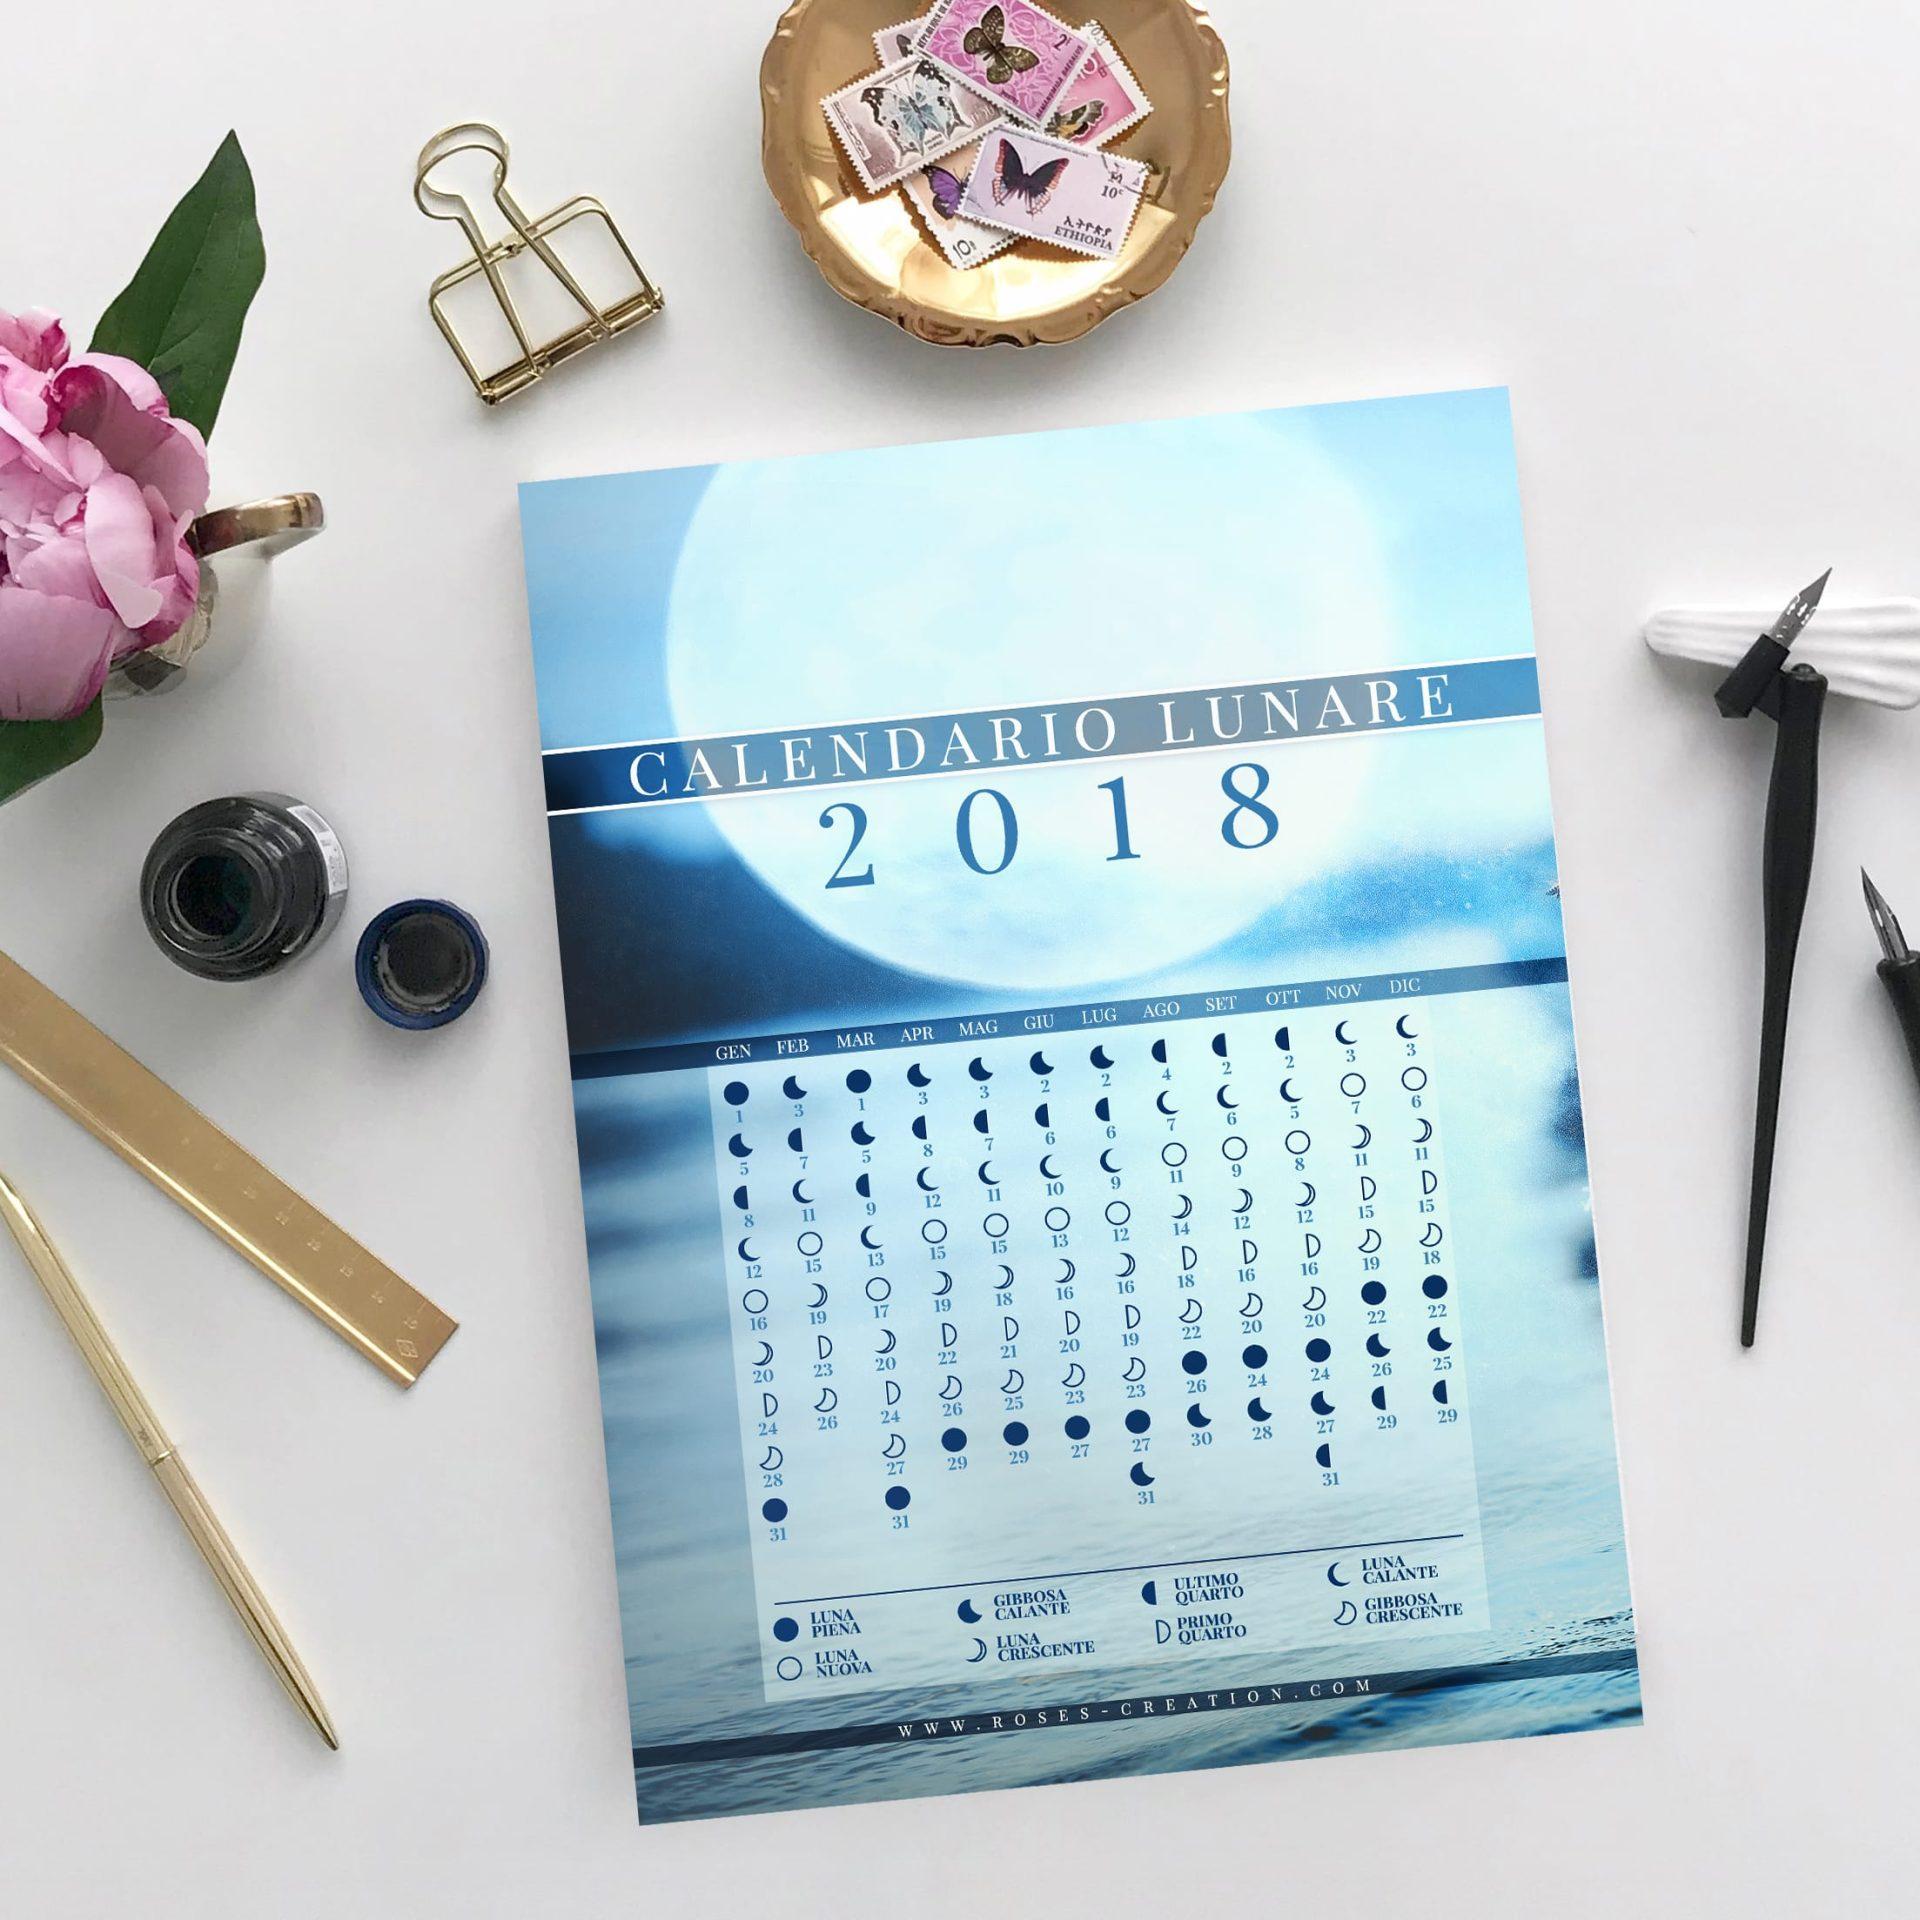 CalendarioLunare2018 In regalo